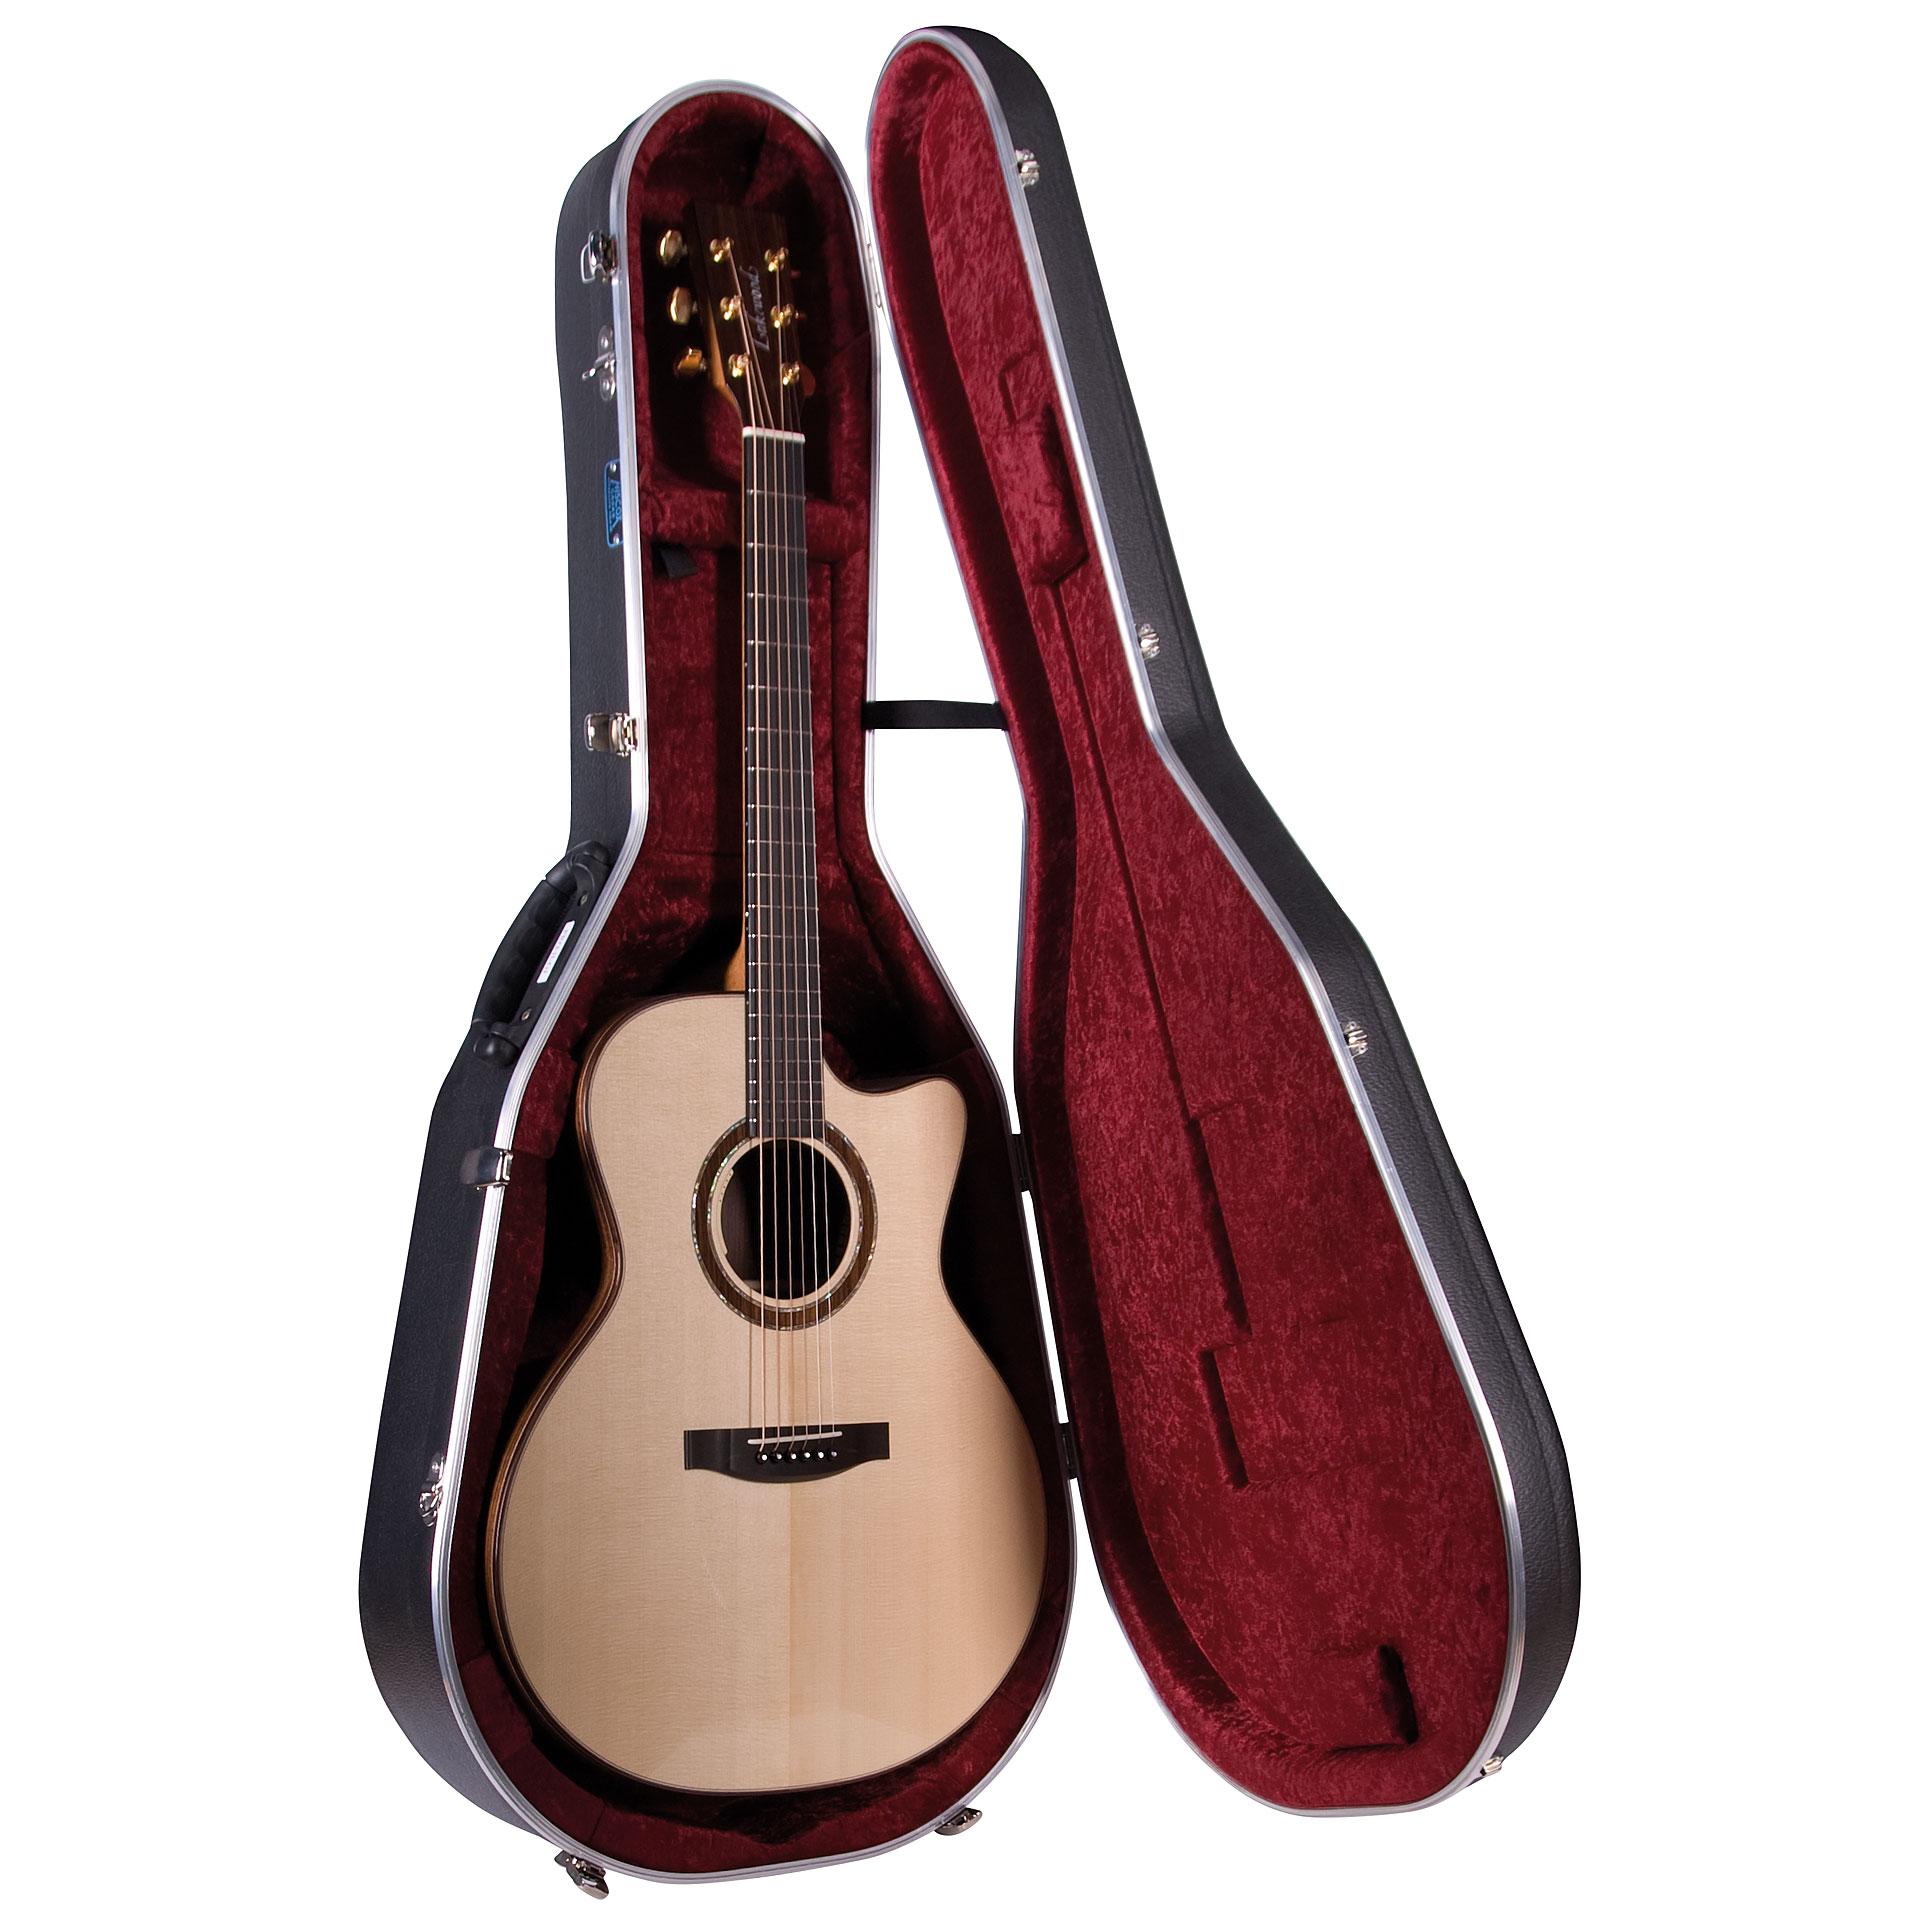 hiscox pro ii gj acoustic guitar case. Black Bedroom Furniture Sets. Home Design Ideas